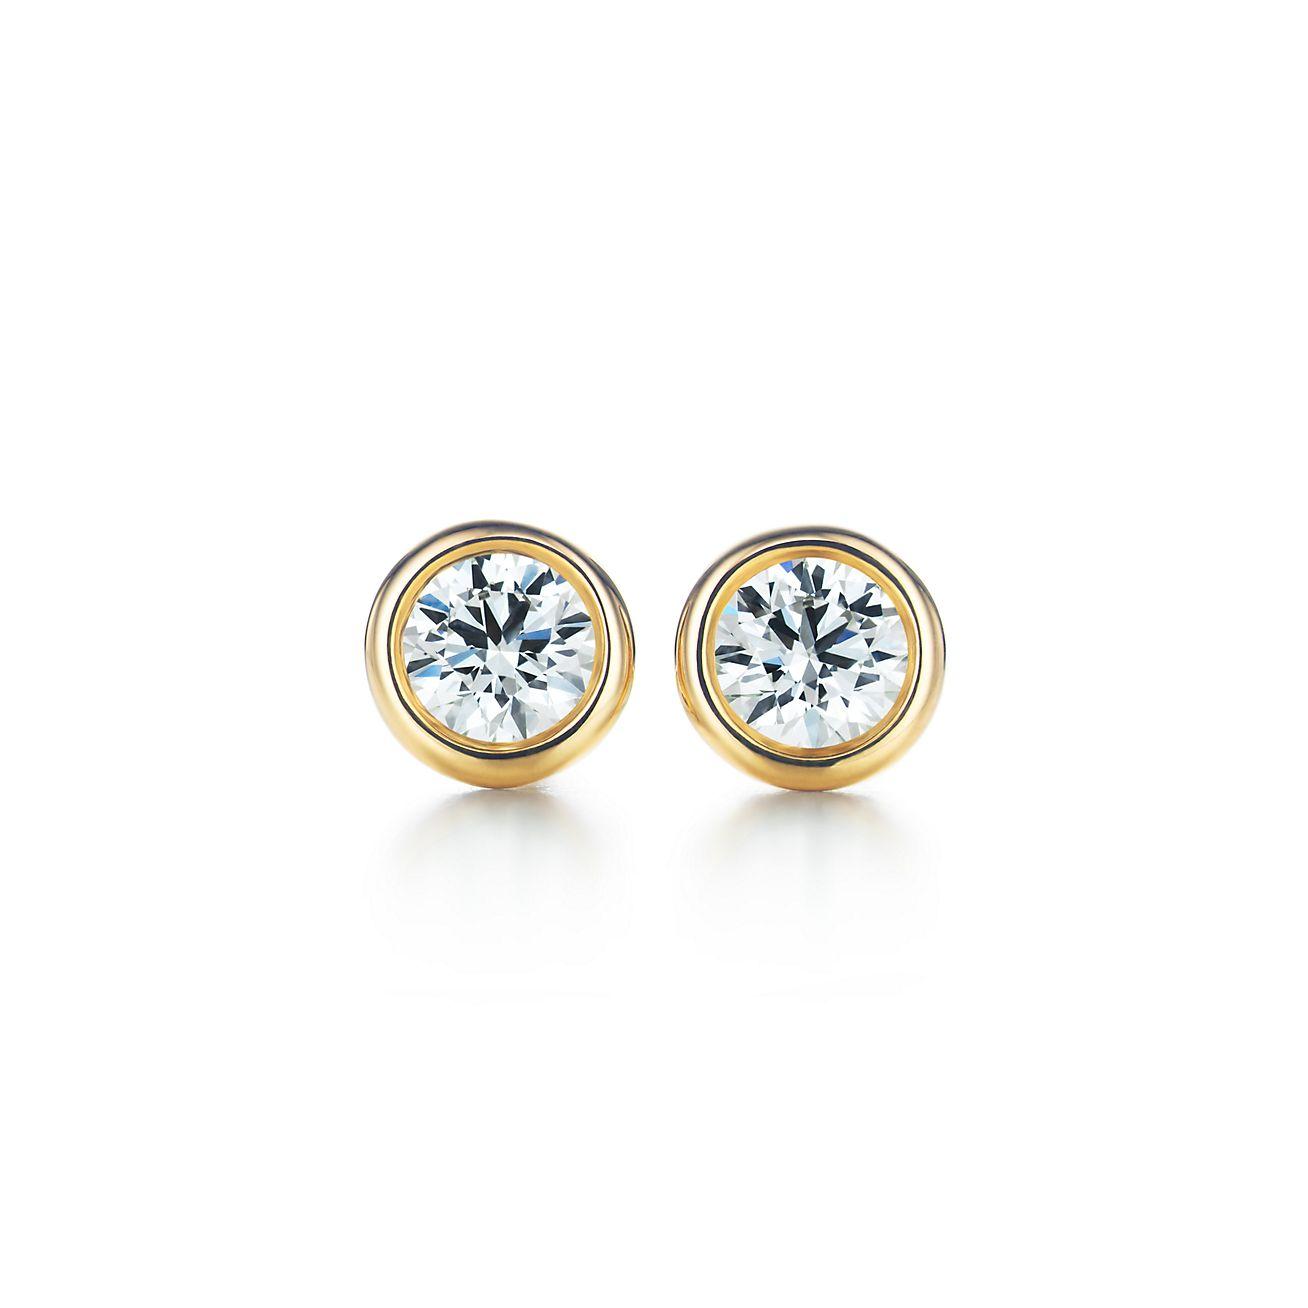 Elsa Peretti Diamonds By The Yard Earrings